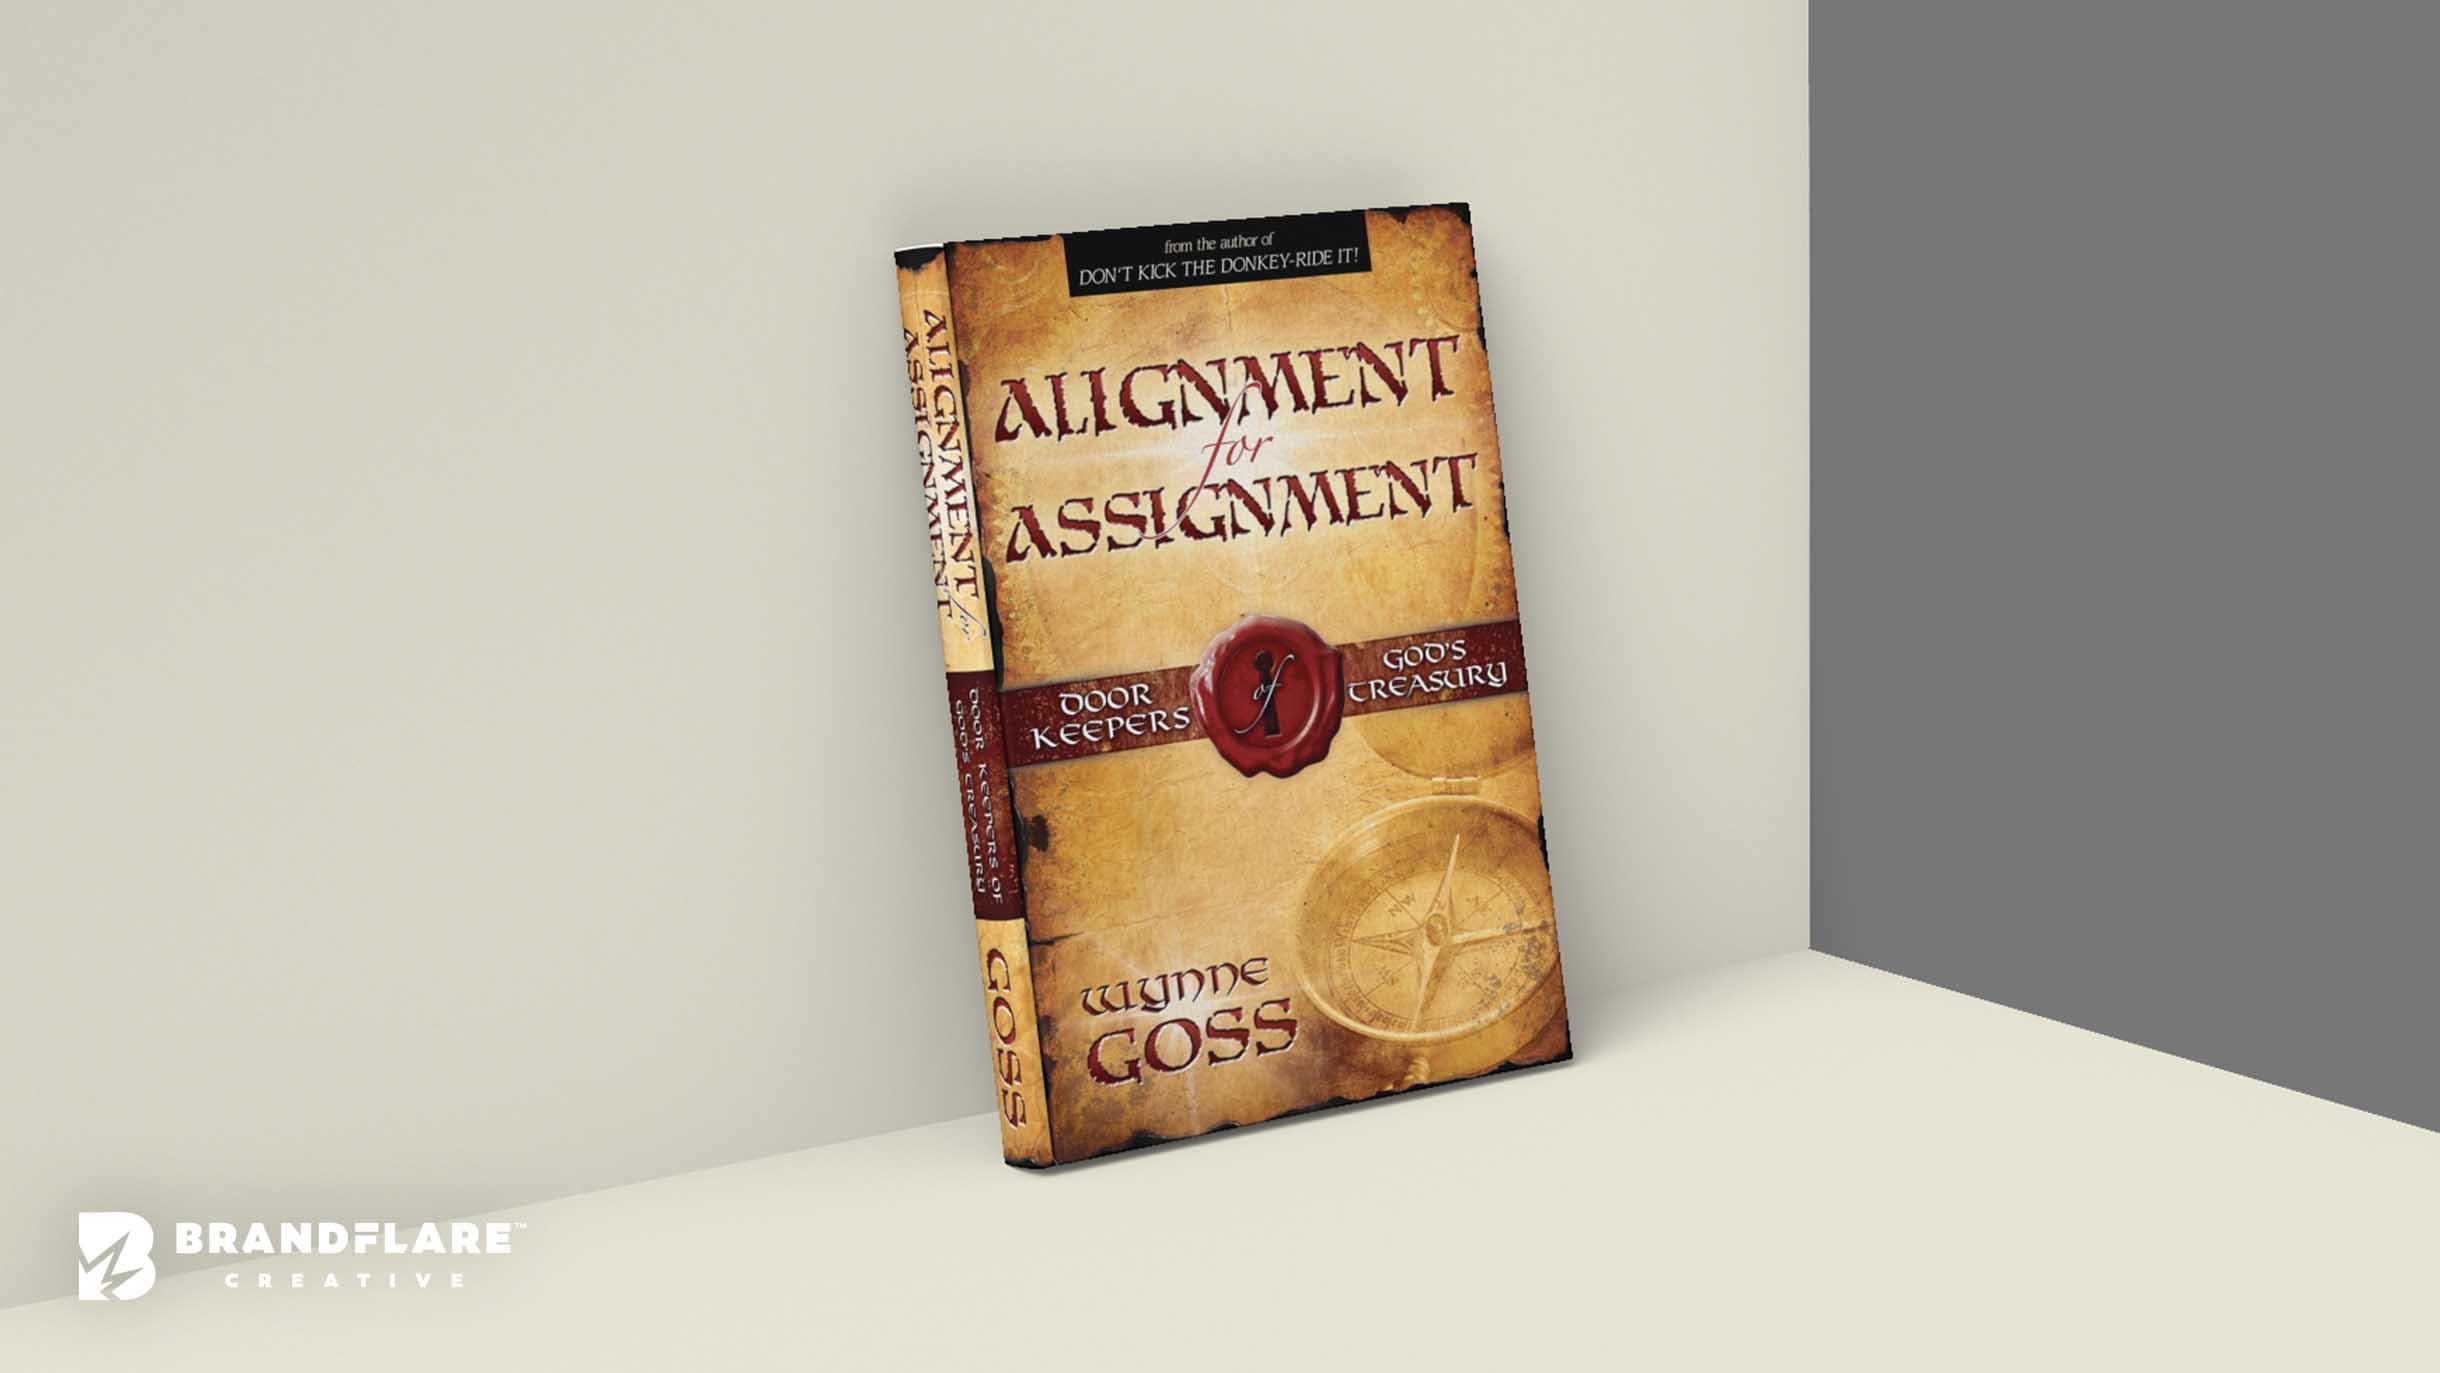 Wynne Goss Book Design - Book Cover Graphic Design - BrandFlare Creative